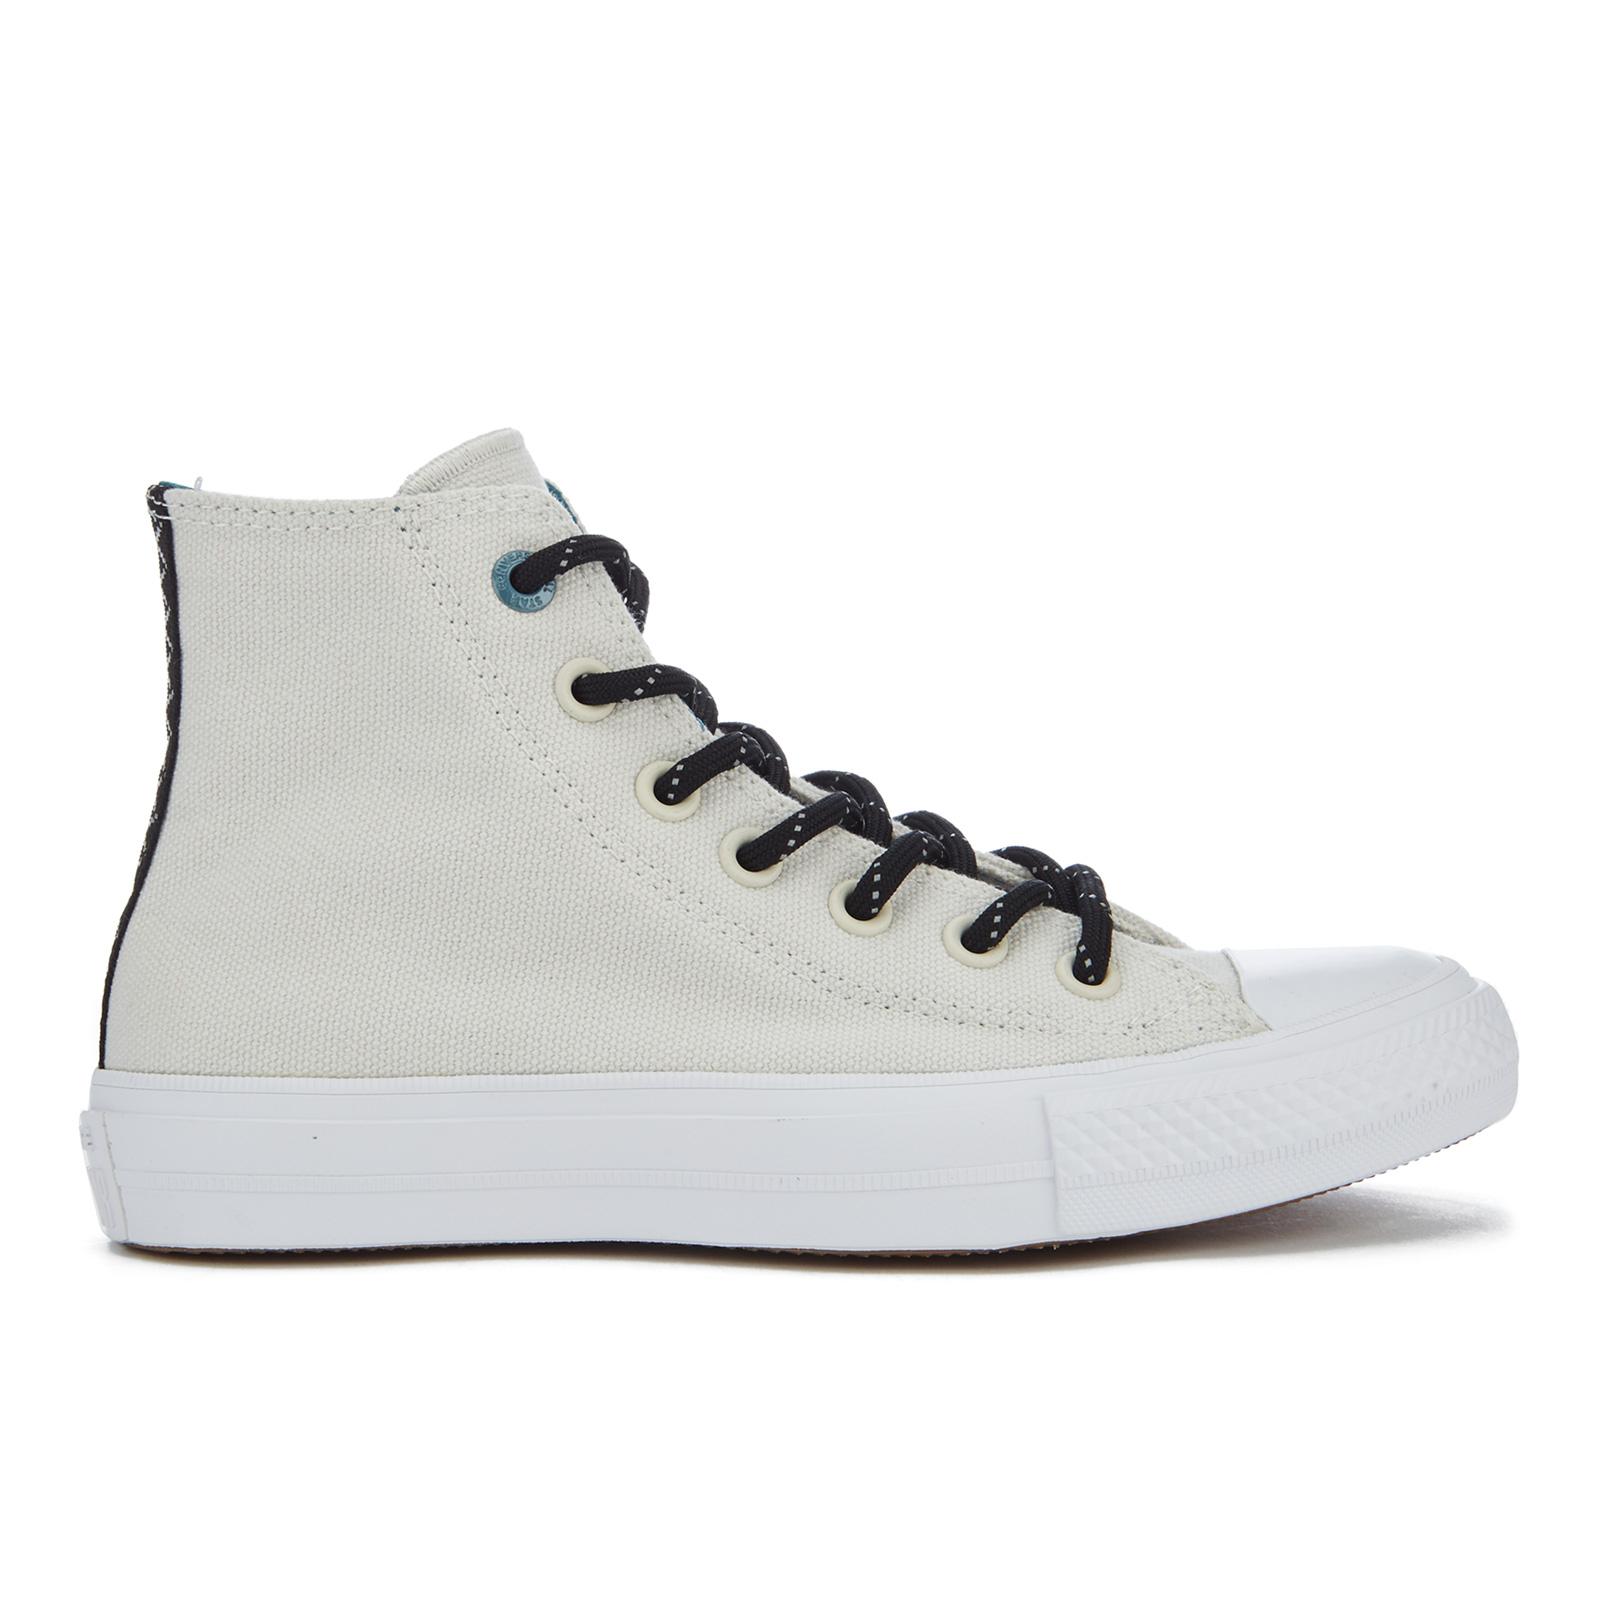 8830ef2a7950 Converse Women s Chuck Taylor All Star II Shield Canvas Hi-Top Trainers -  Buff Cool Jade White Womens Footwear